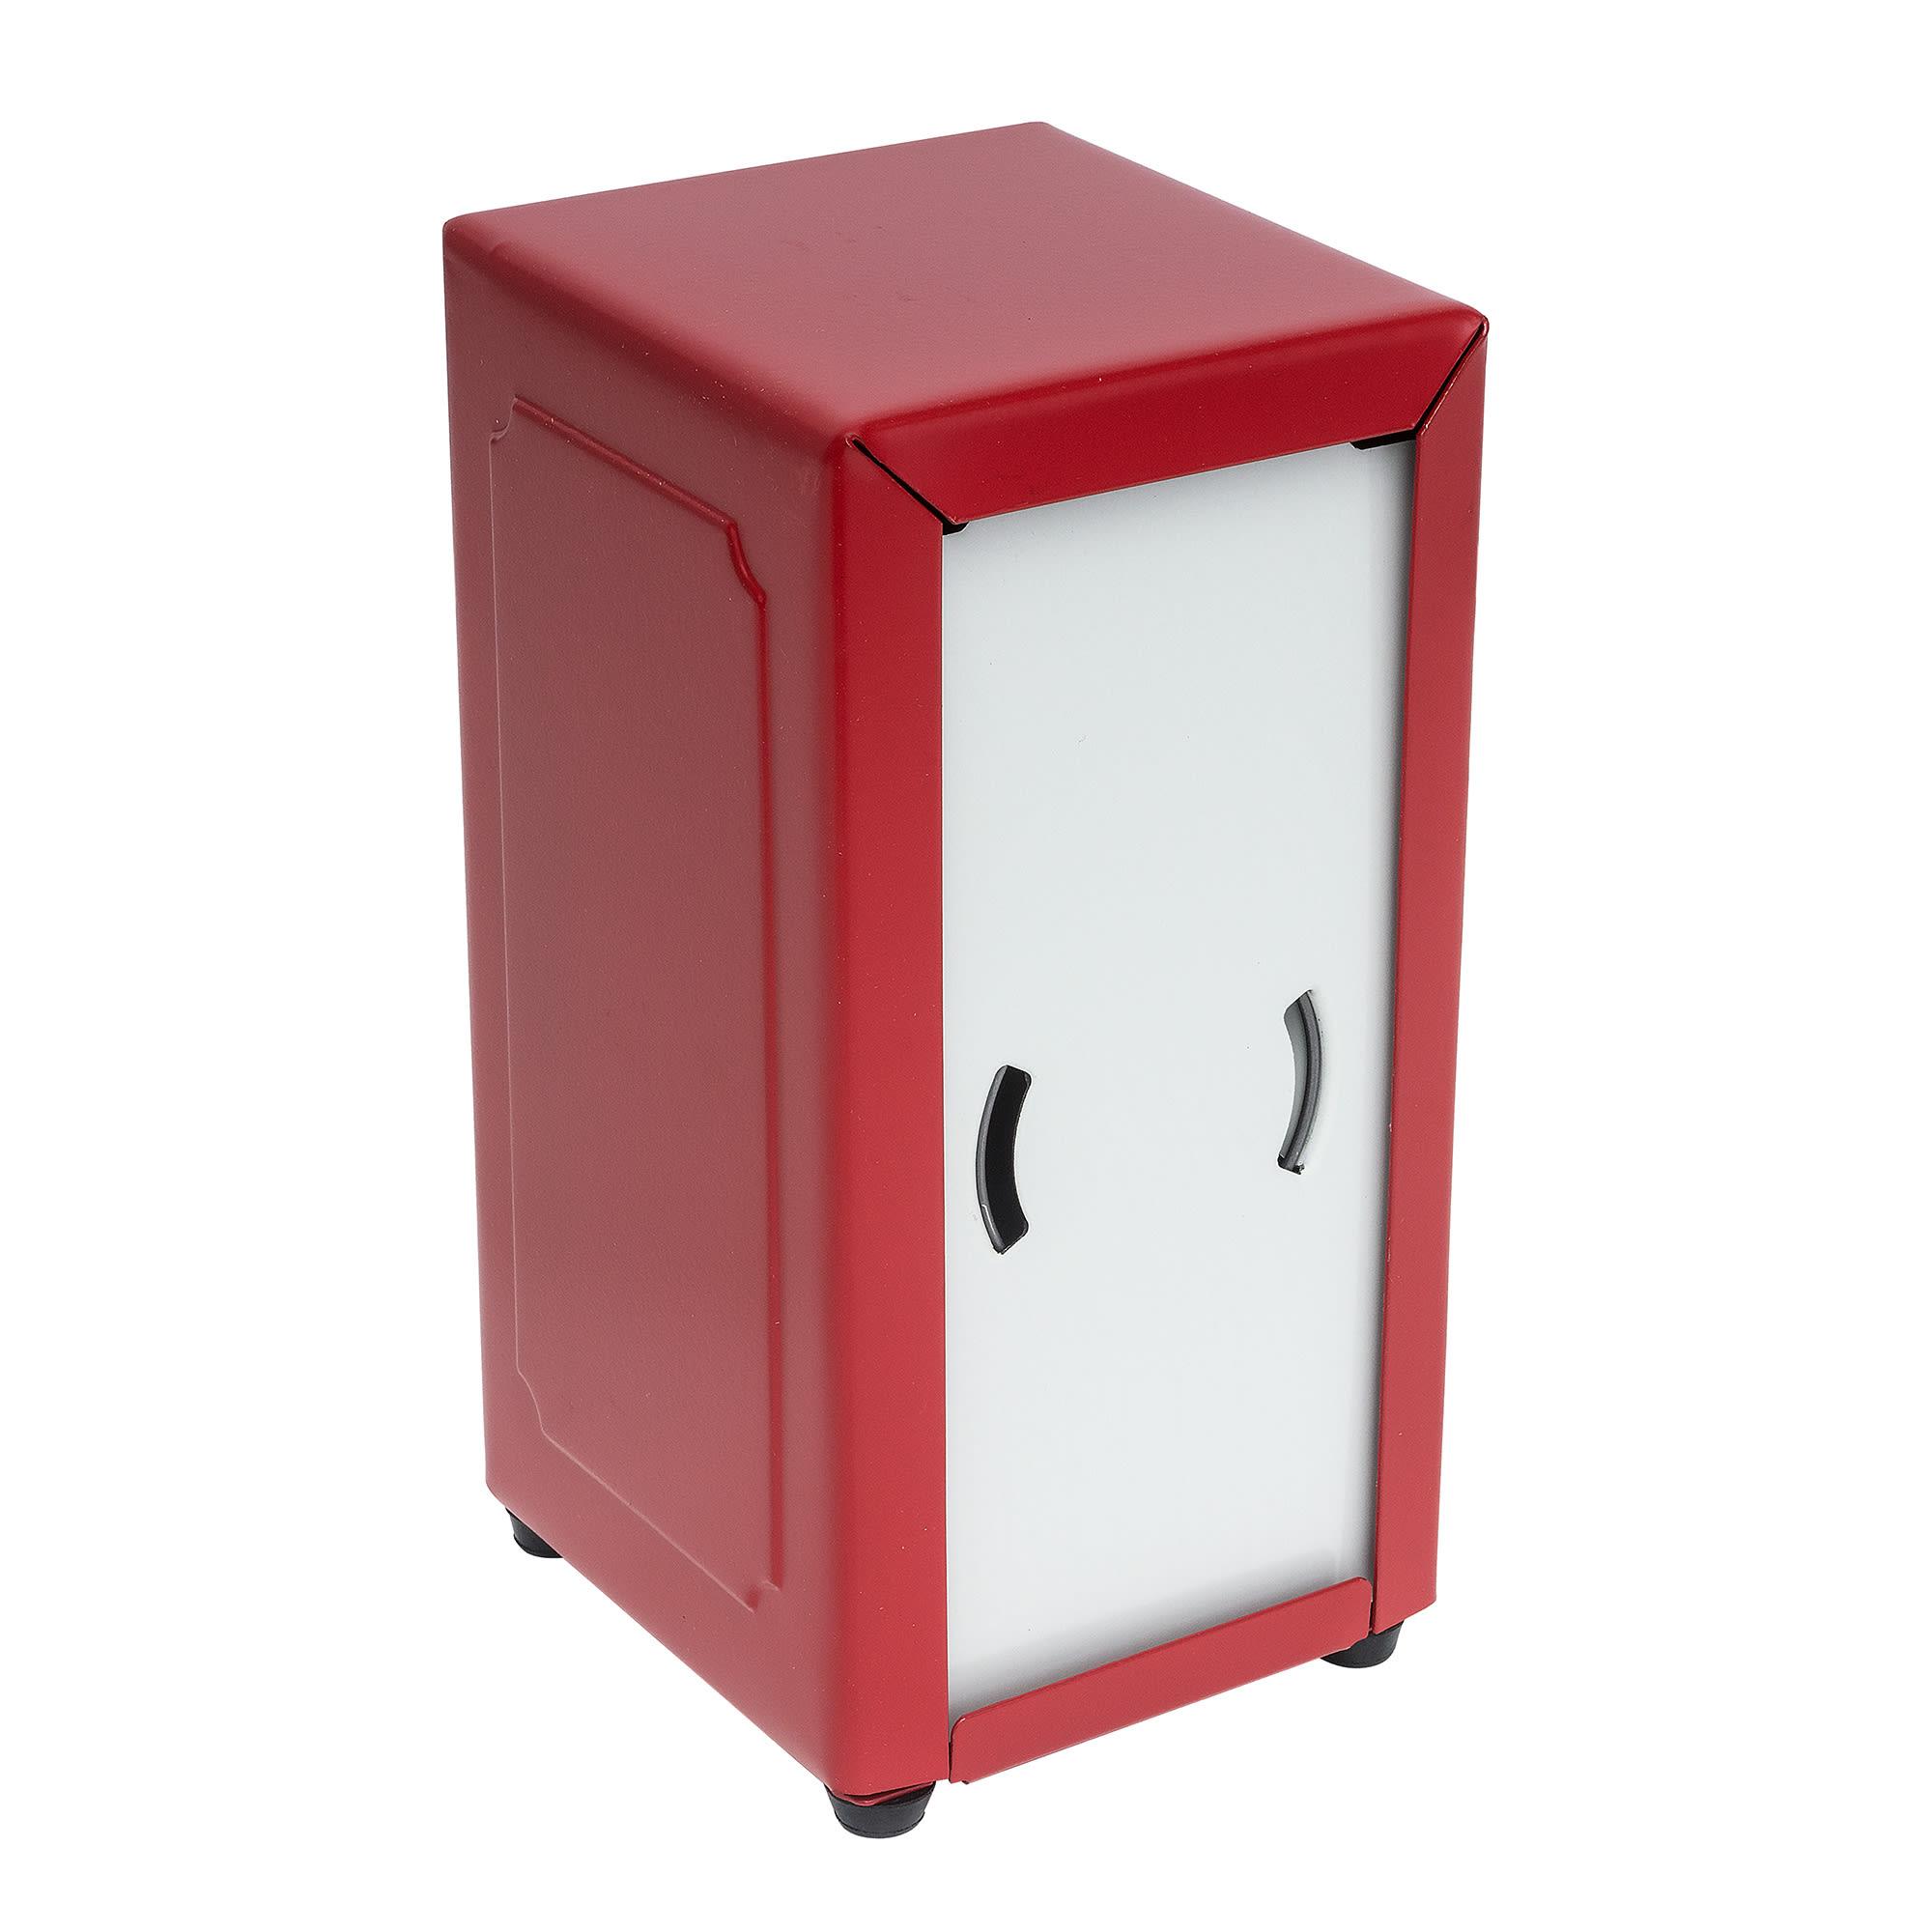 "Tablecraft 2211 Napkin Dispenser, 4-3/4 x 3-7/8 x 7-1/2"", Full Size, Red"